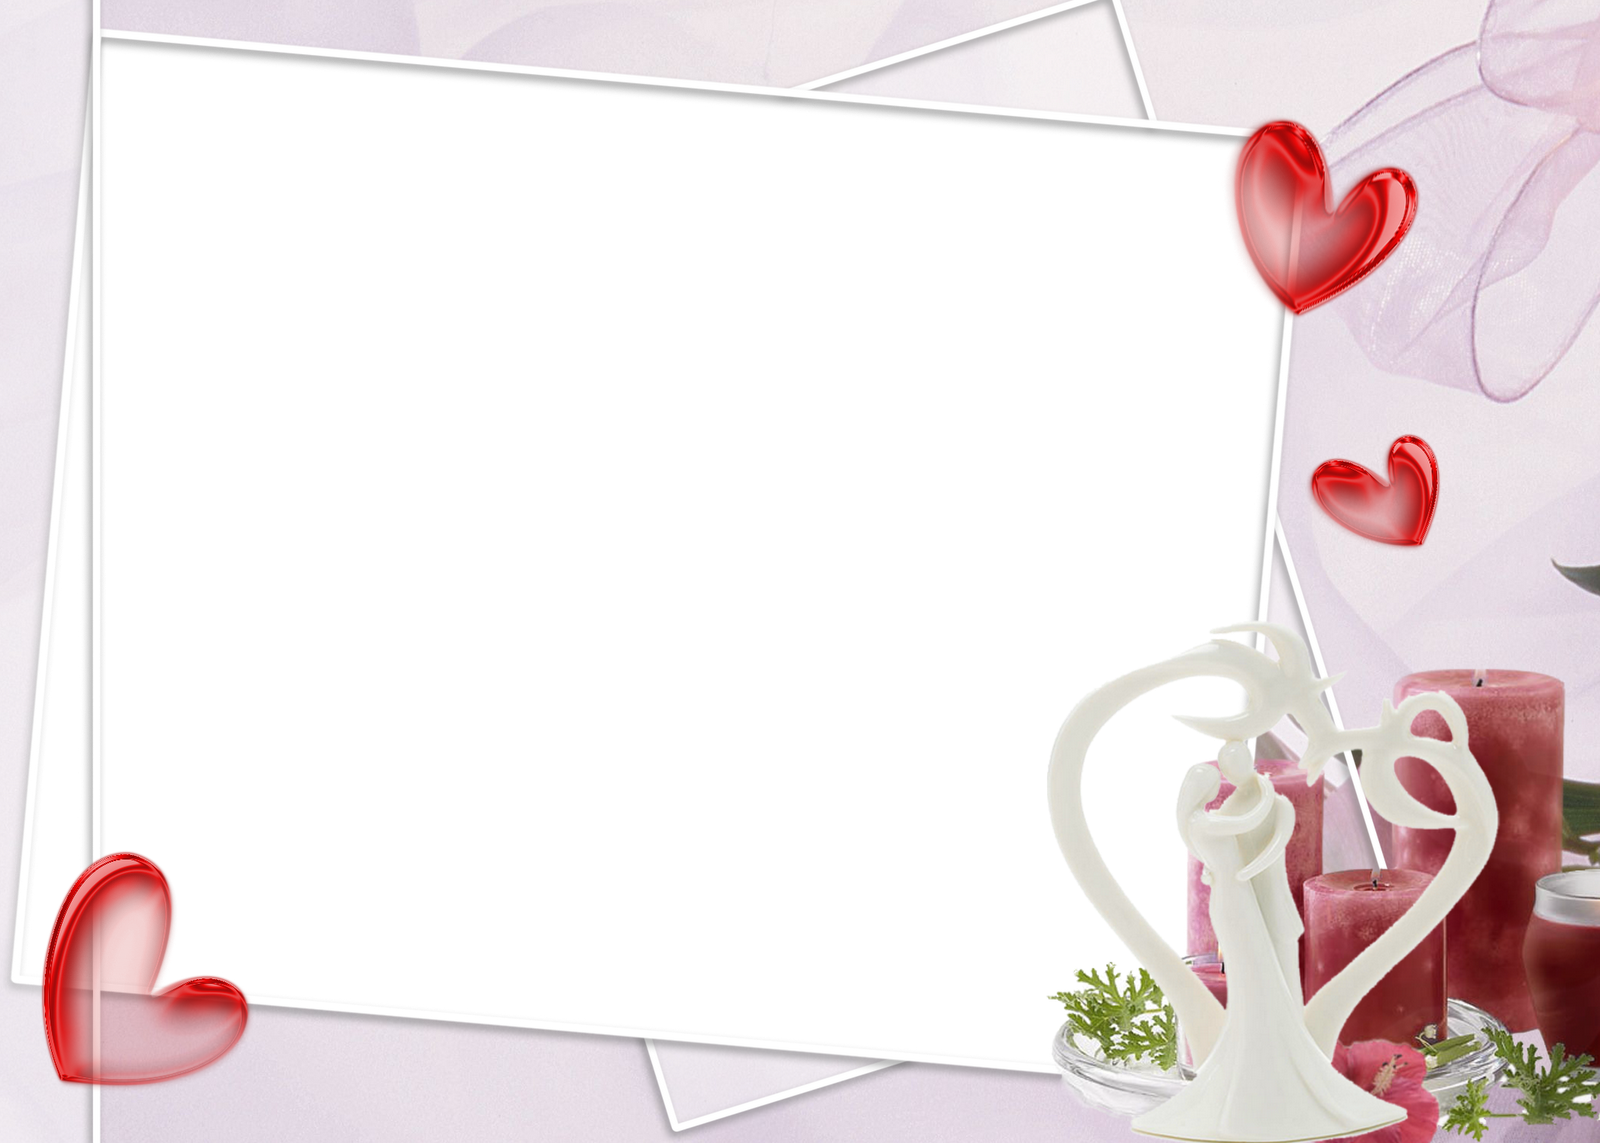 marcos para fotos familiares - Ideal.vistalist.co